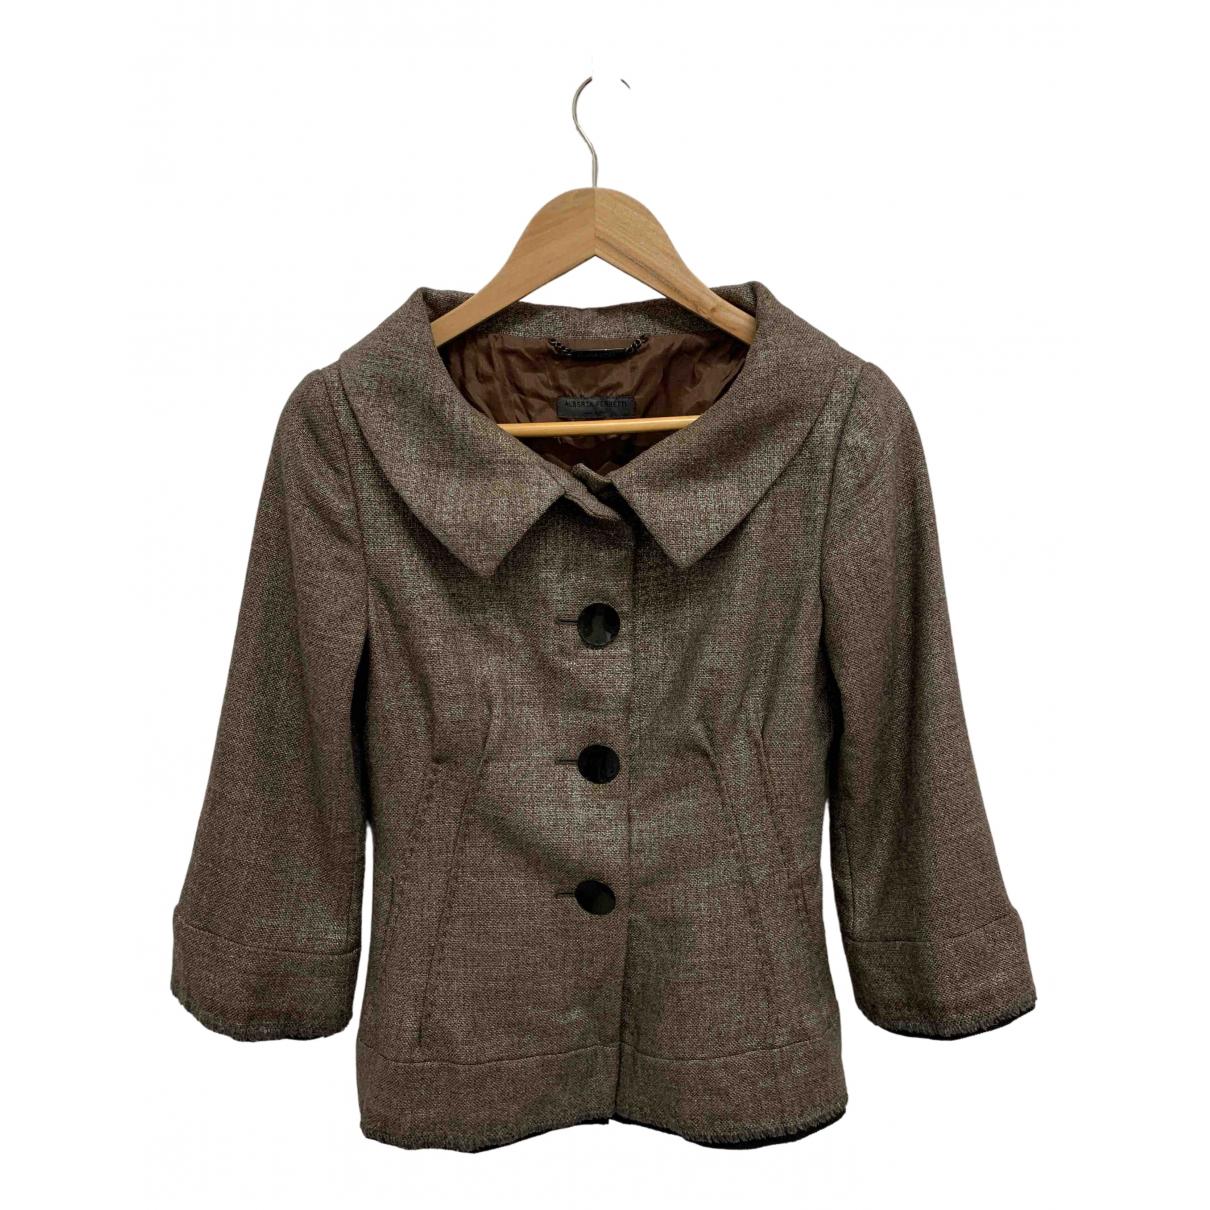 Alberta Ferretti - Veste   pour femme en laine - marron